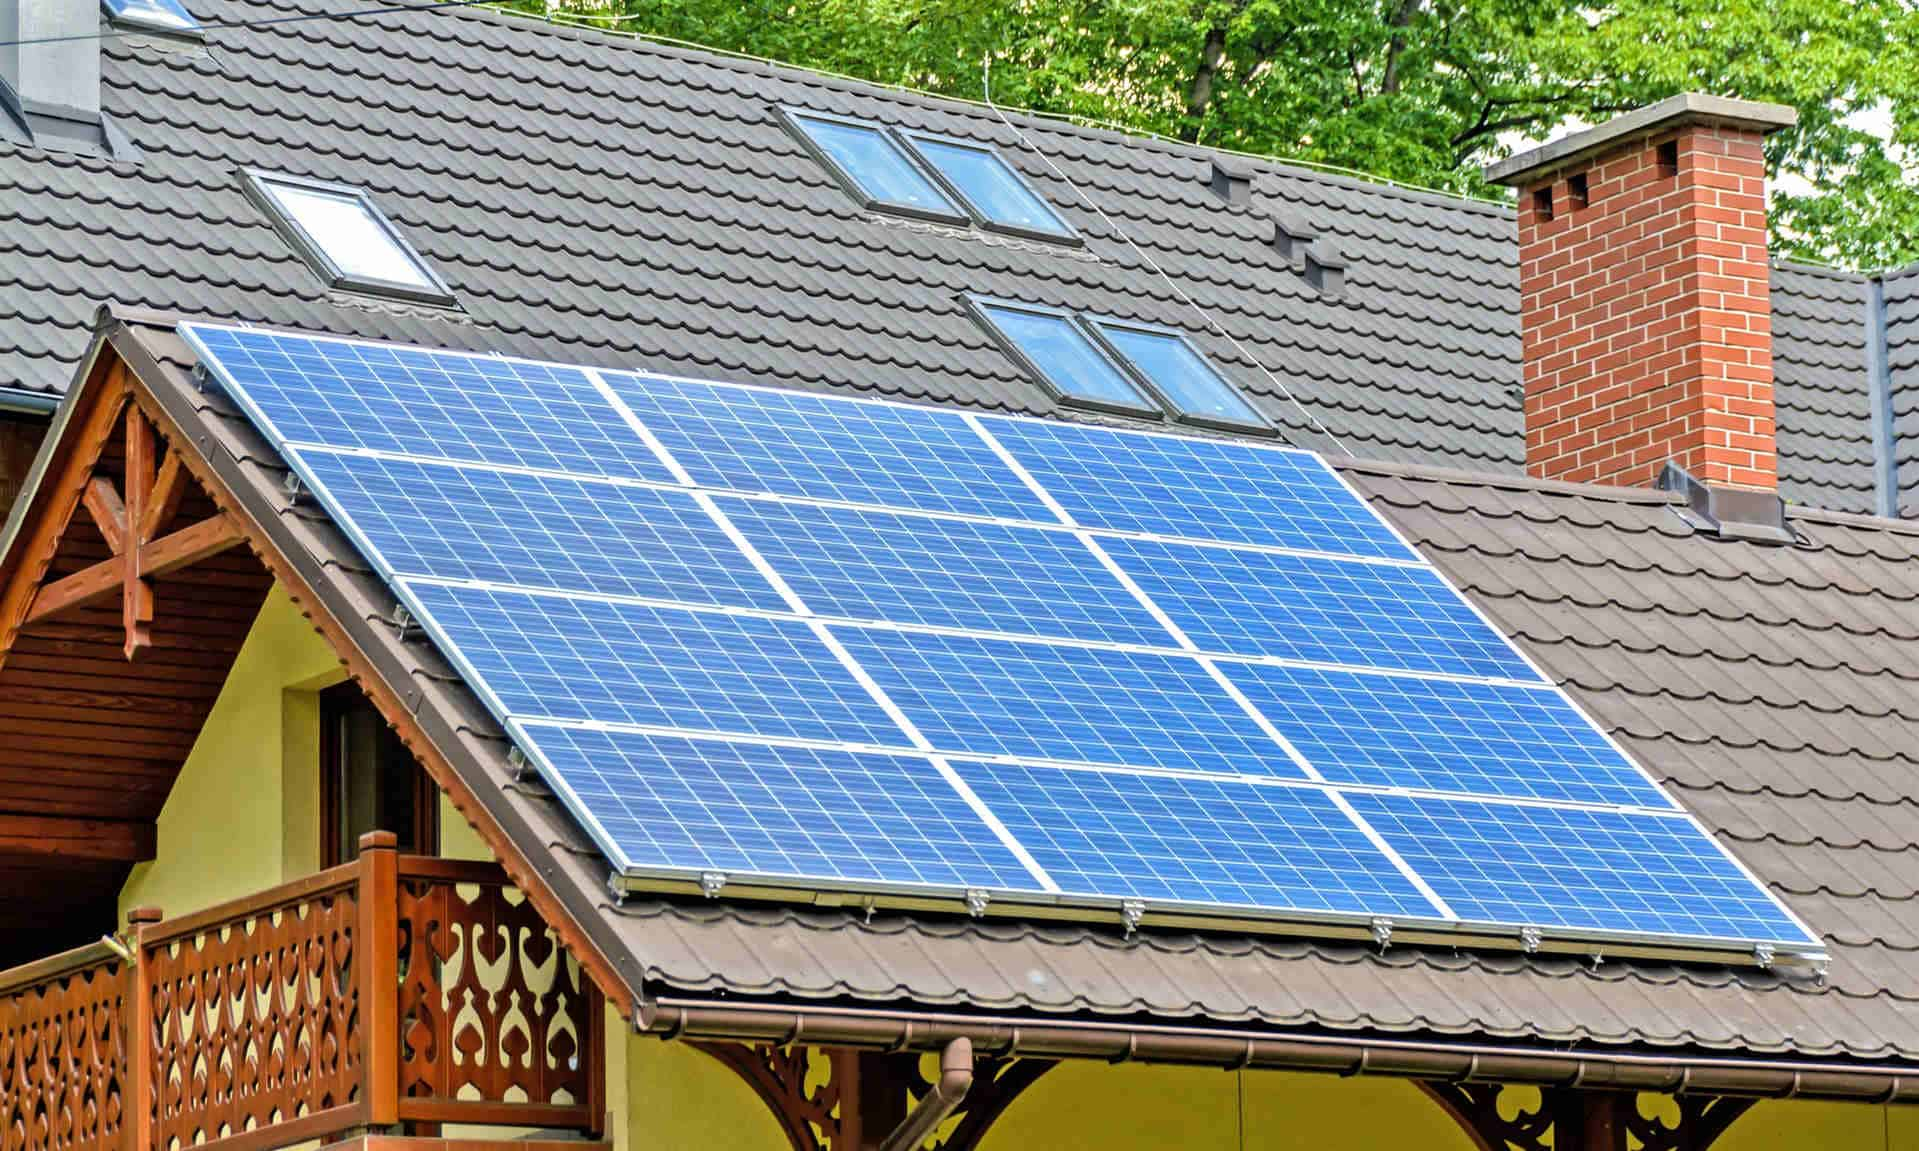 solar thermal panels vs photovoltaic panels